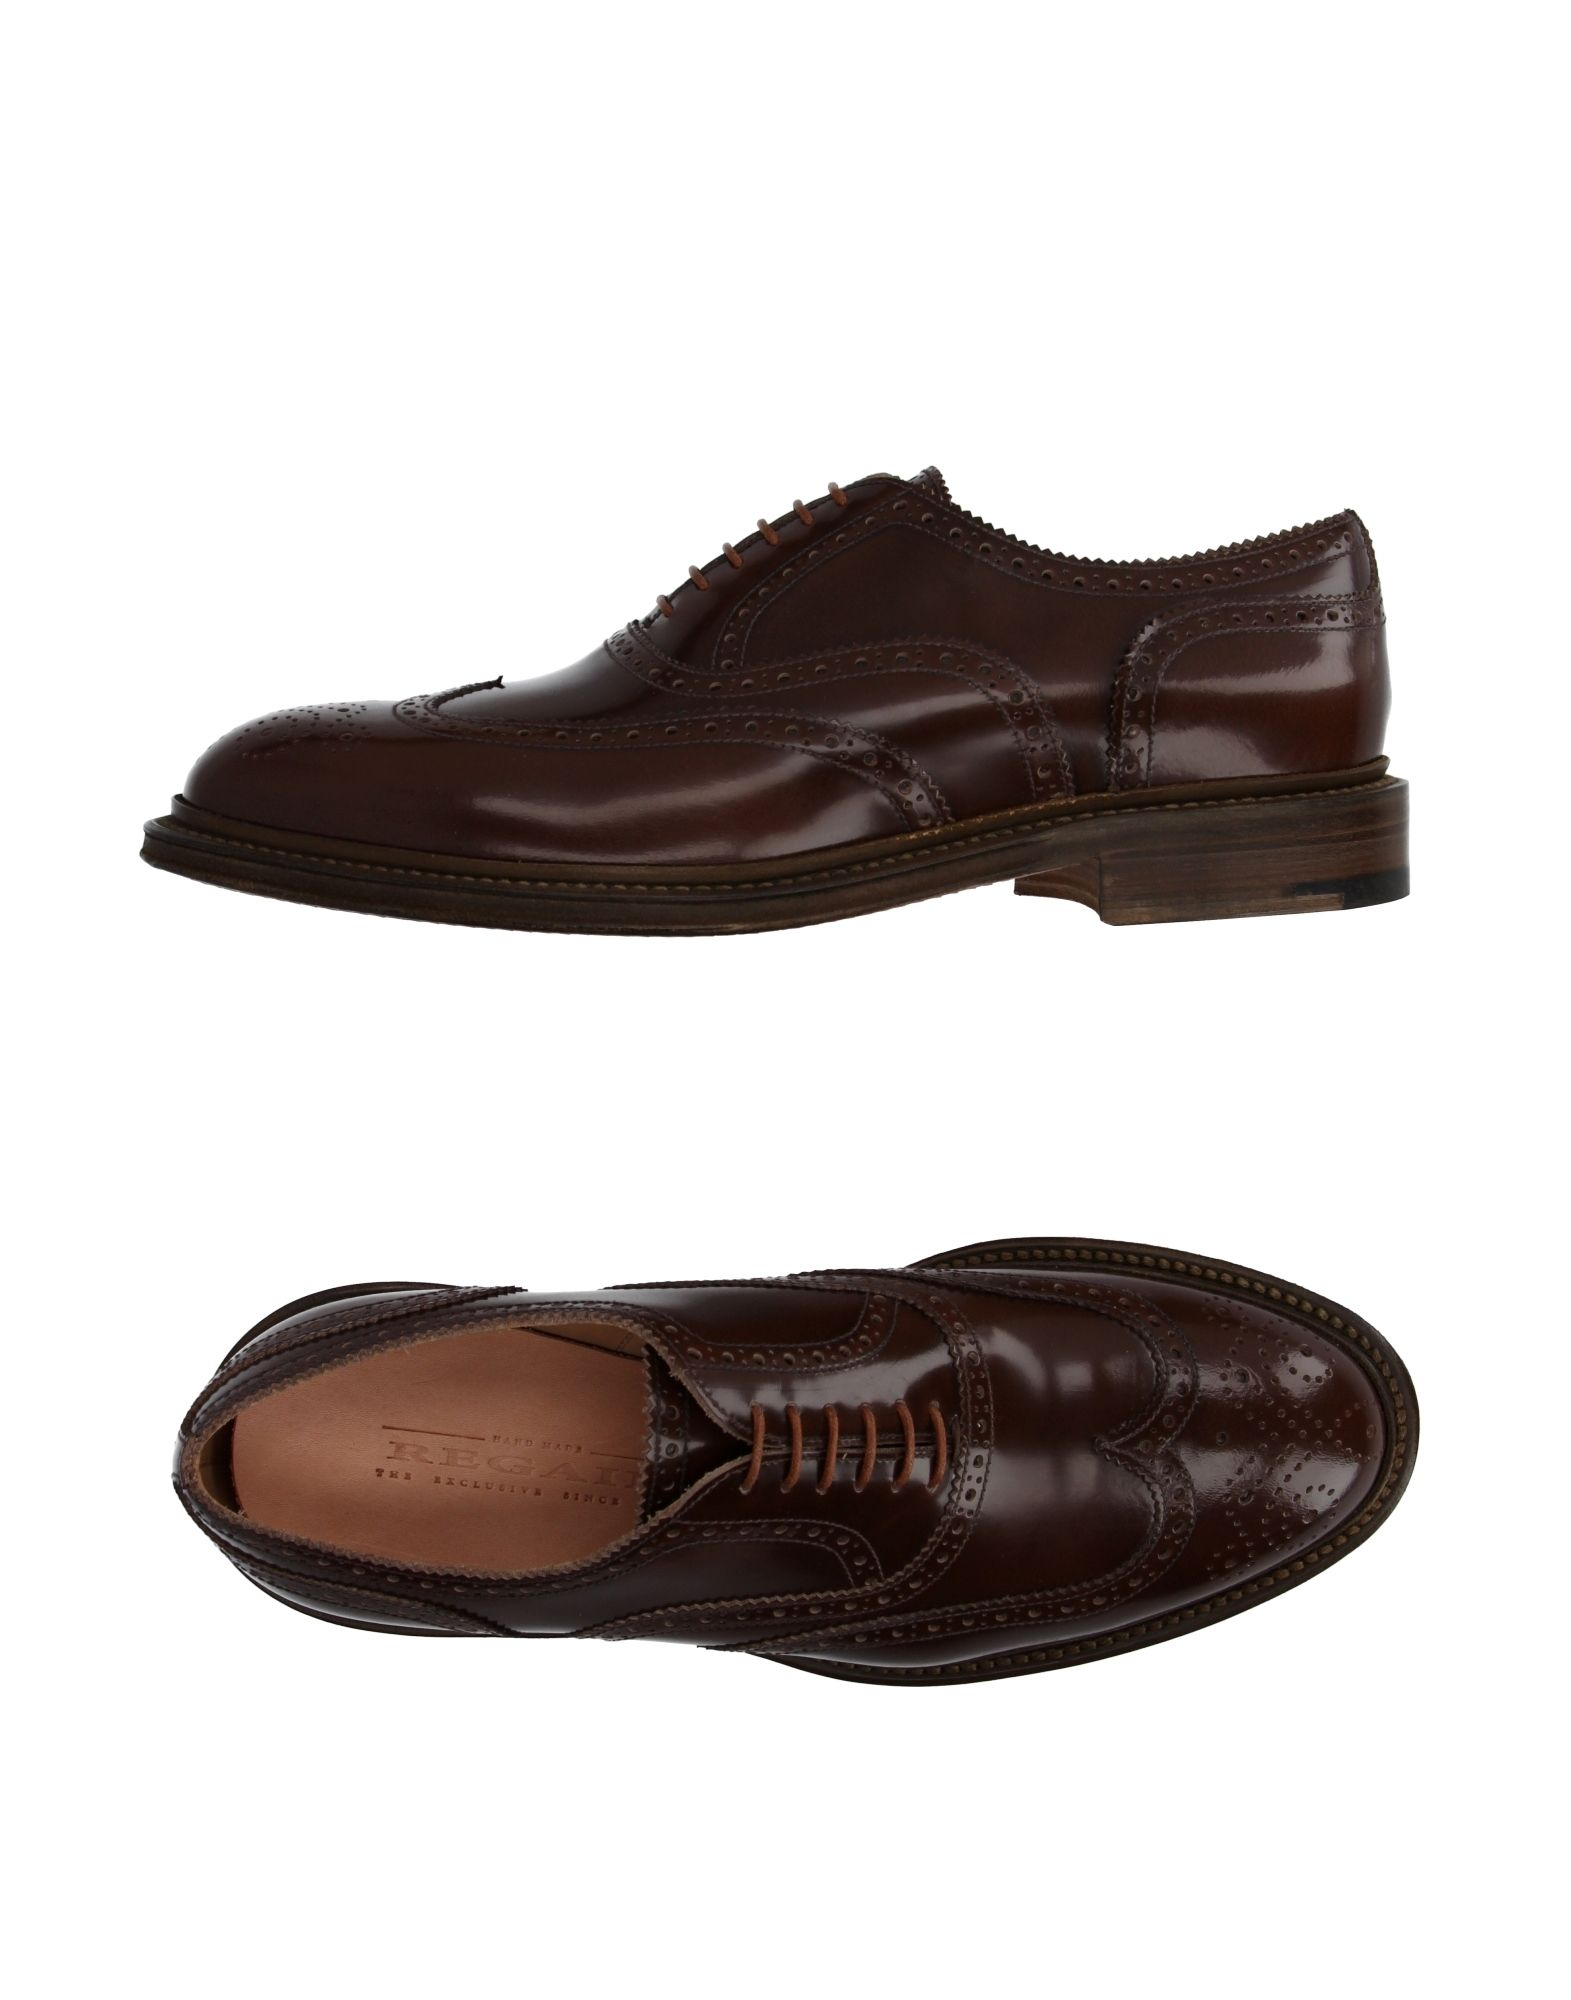 Regain Schuhe Schnürschuhe Herren  11028142KR Gute Qualität beliebte Schuhe Regain 5266b6